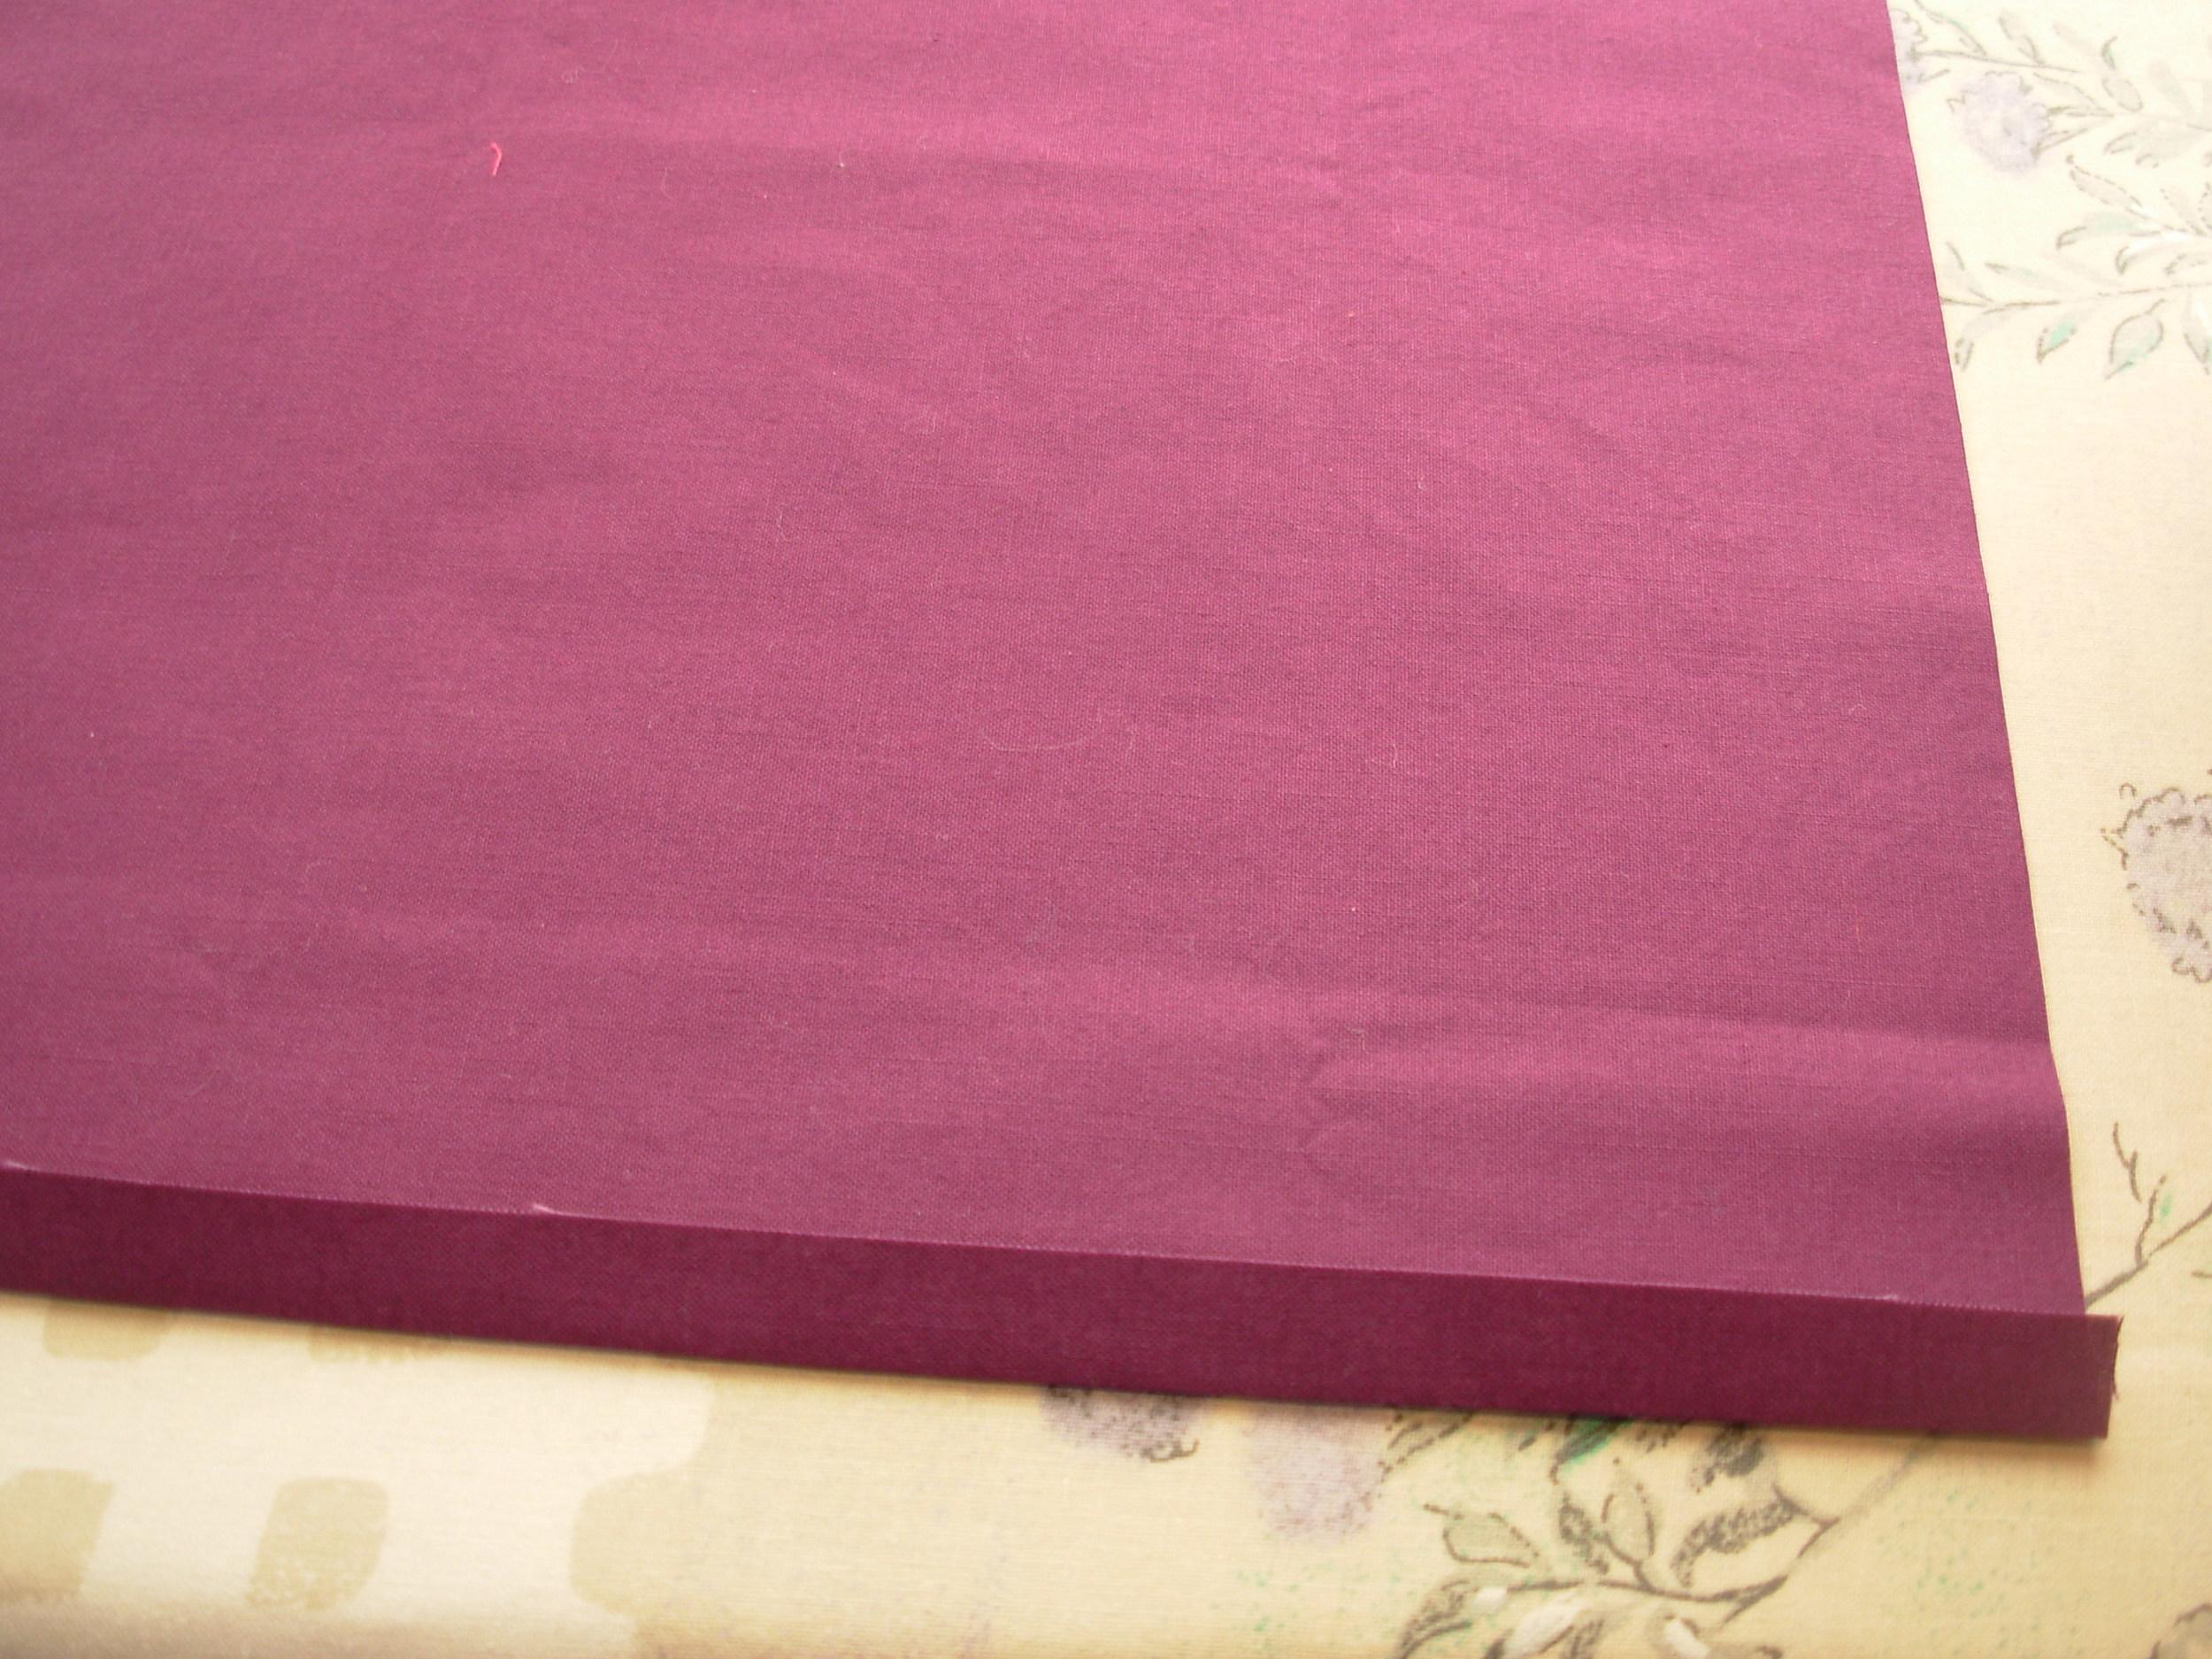 Button Back Pillow Tutorial (4)